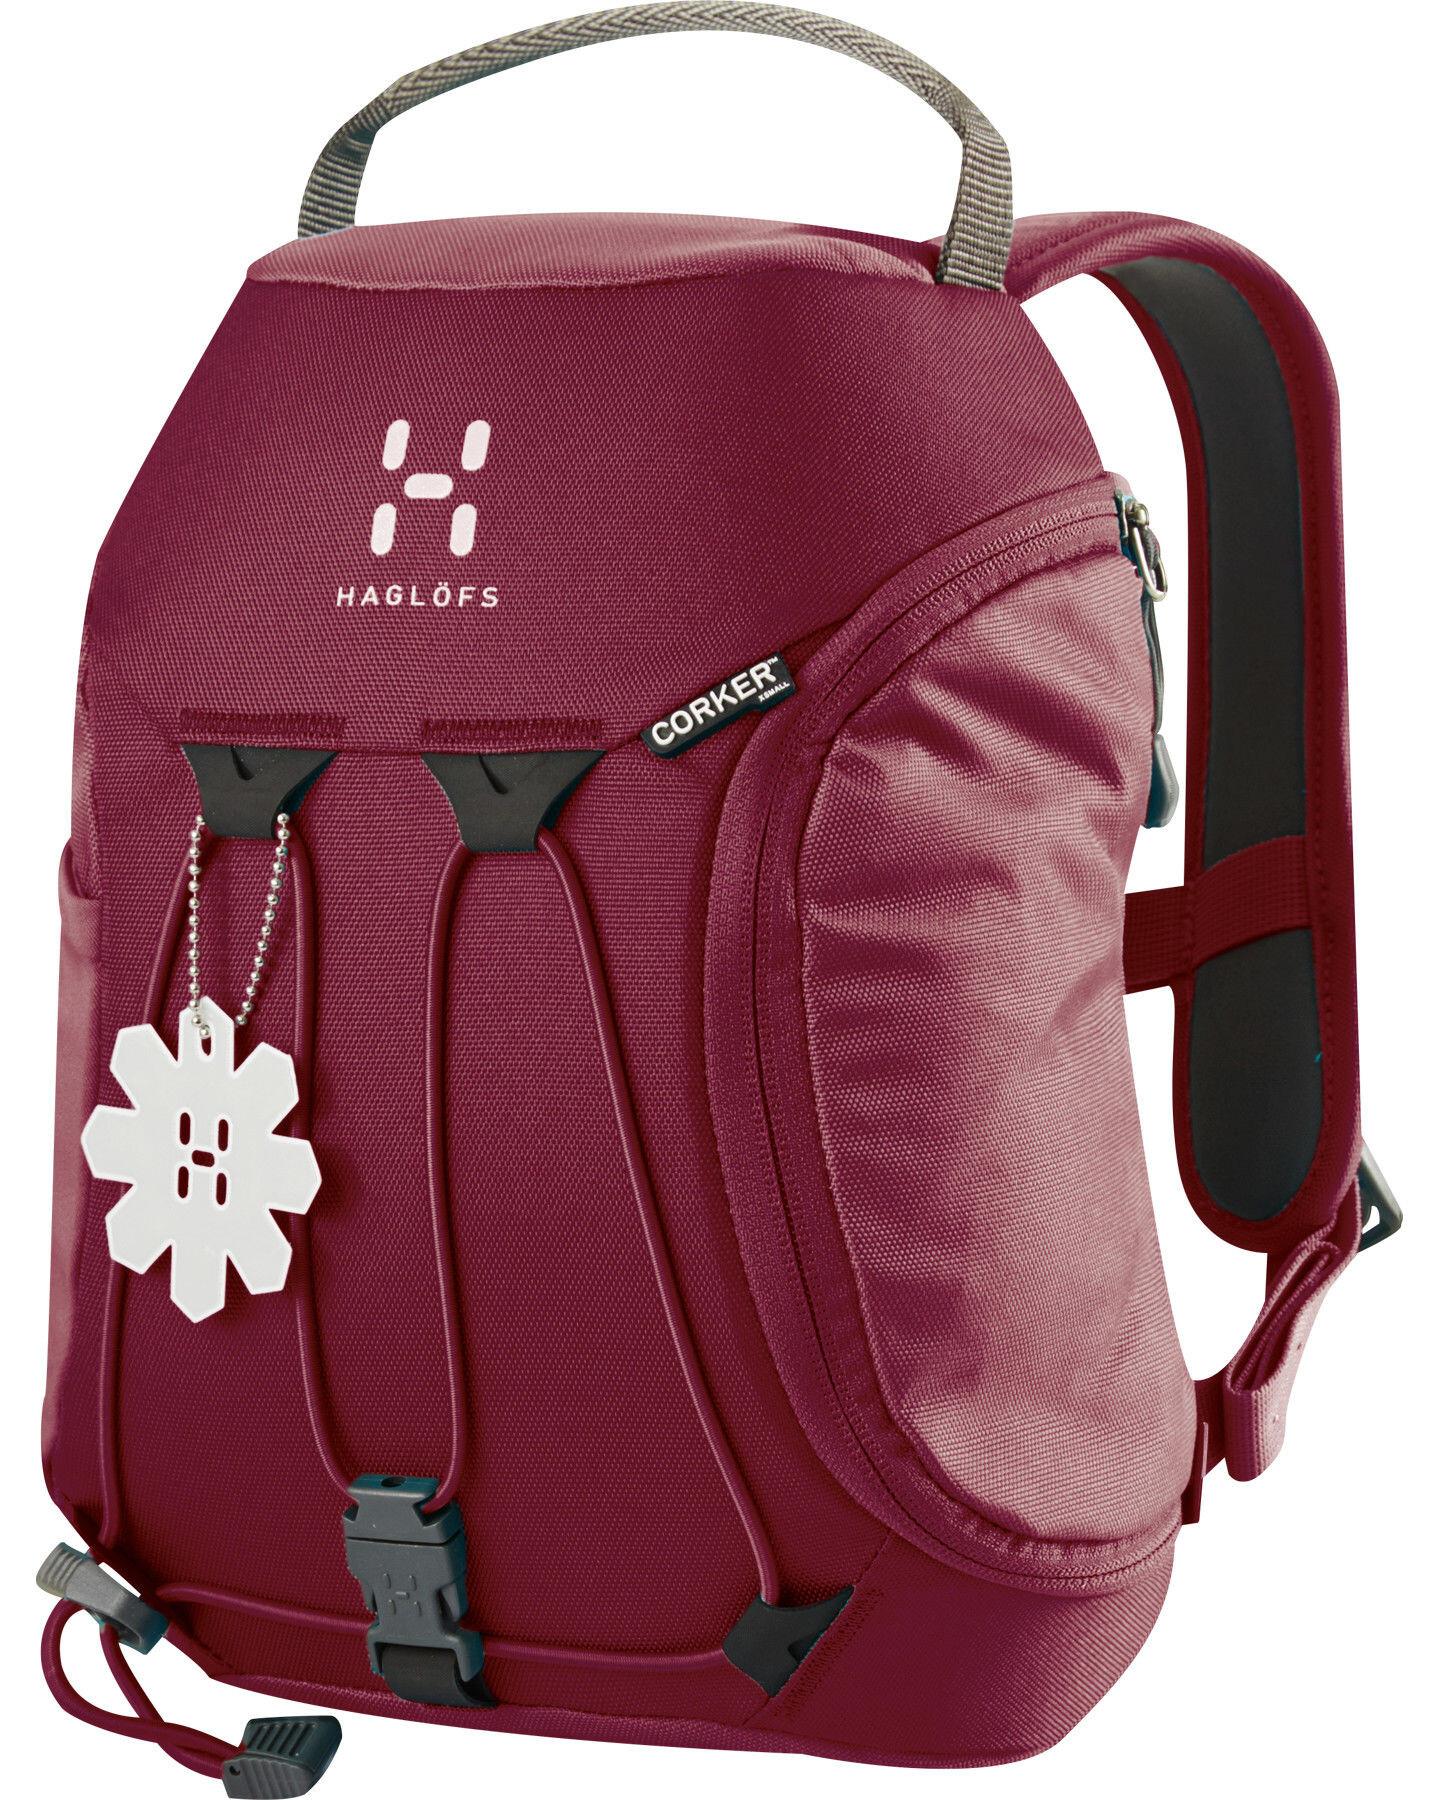 Haglöfs Corker X-Small Backpack Children 5l pink at Addnature.co.uk 5ea988fad0